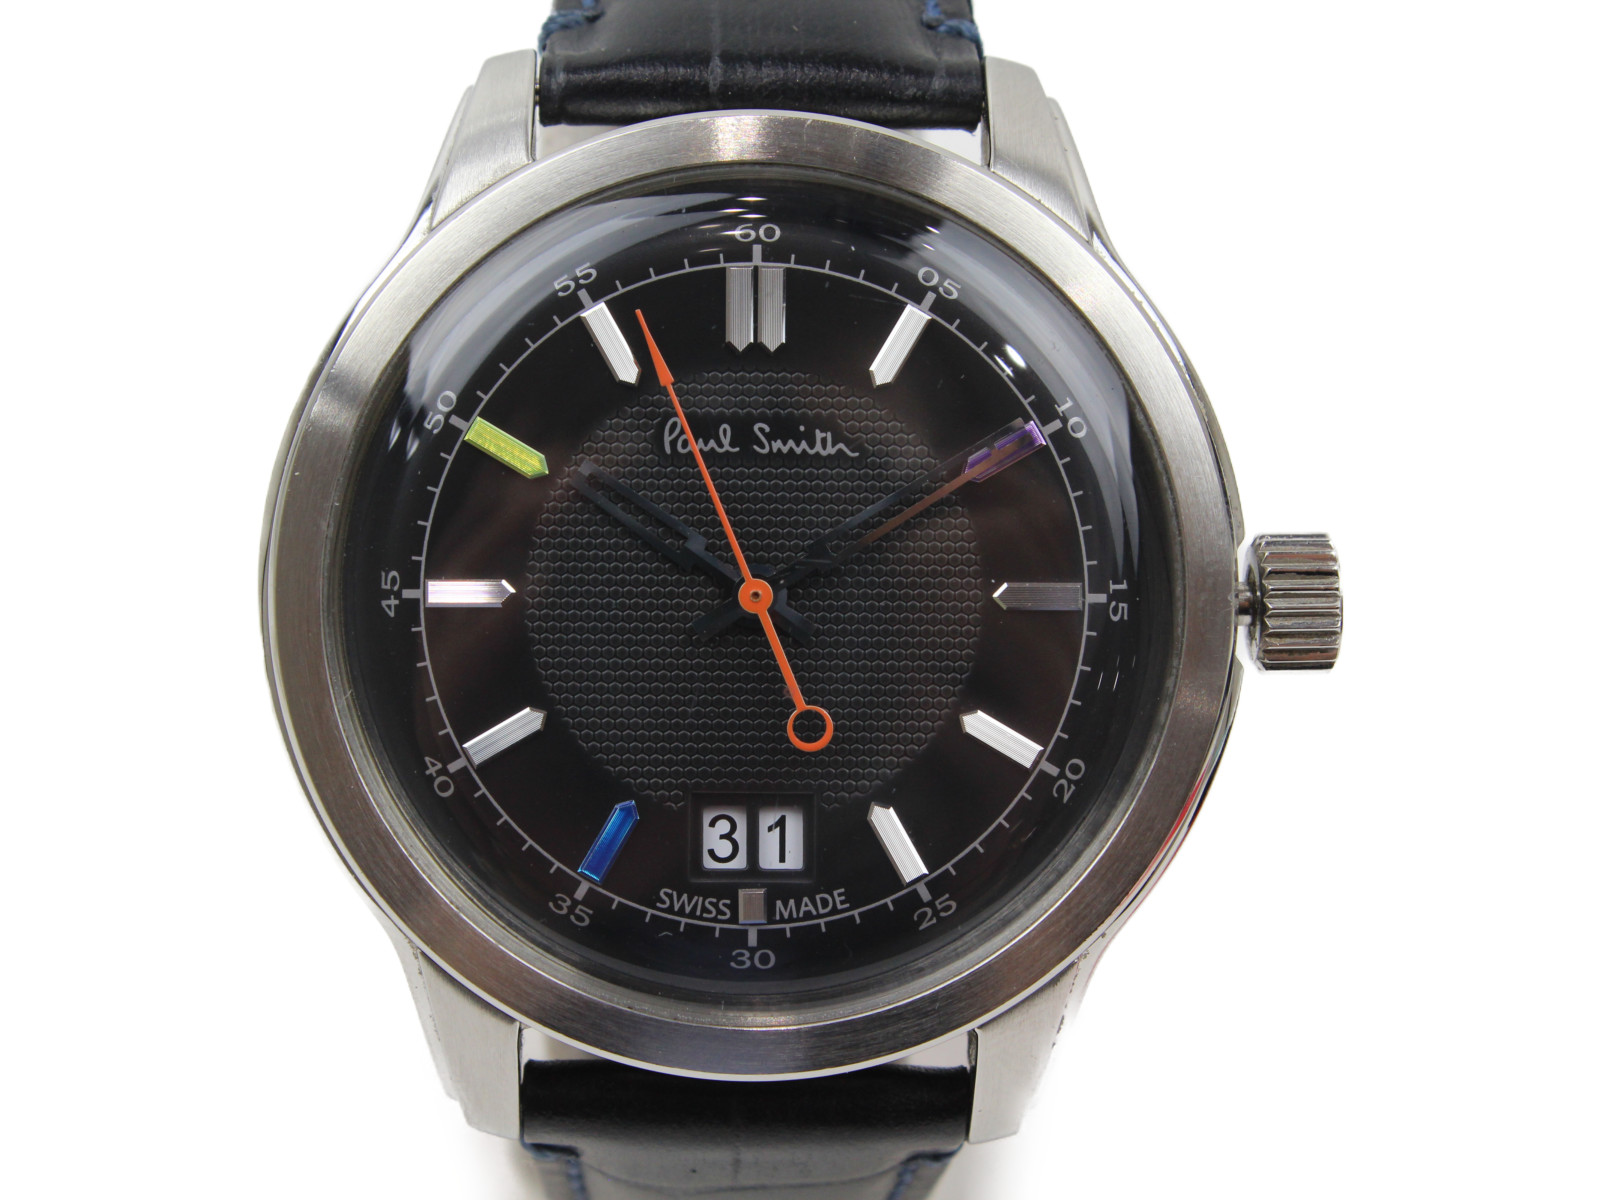 Paul Smith ポール・スミス ケンブリッジ YA30-SO84270 クオーツ デイデイト SS 革ベルト レインボー ブラック メンズ 腕時計【中古】